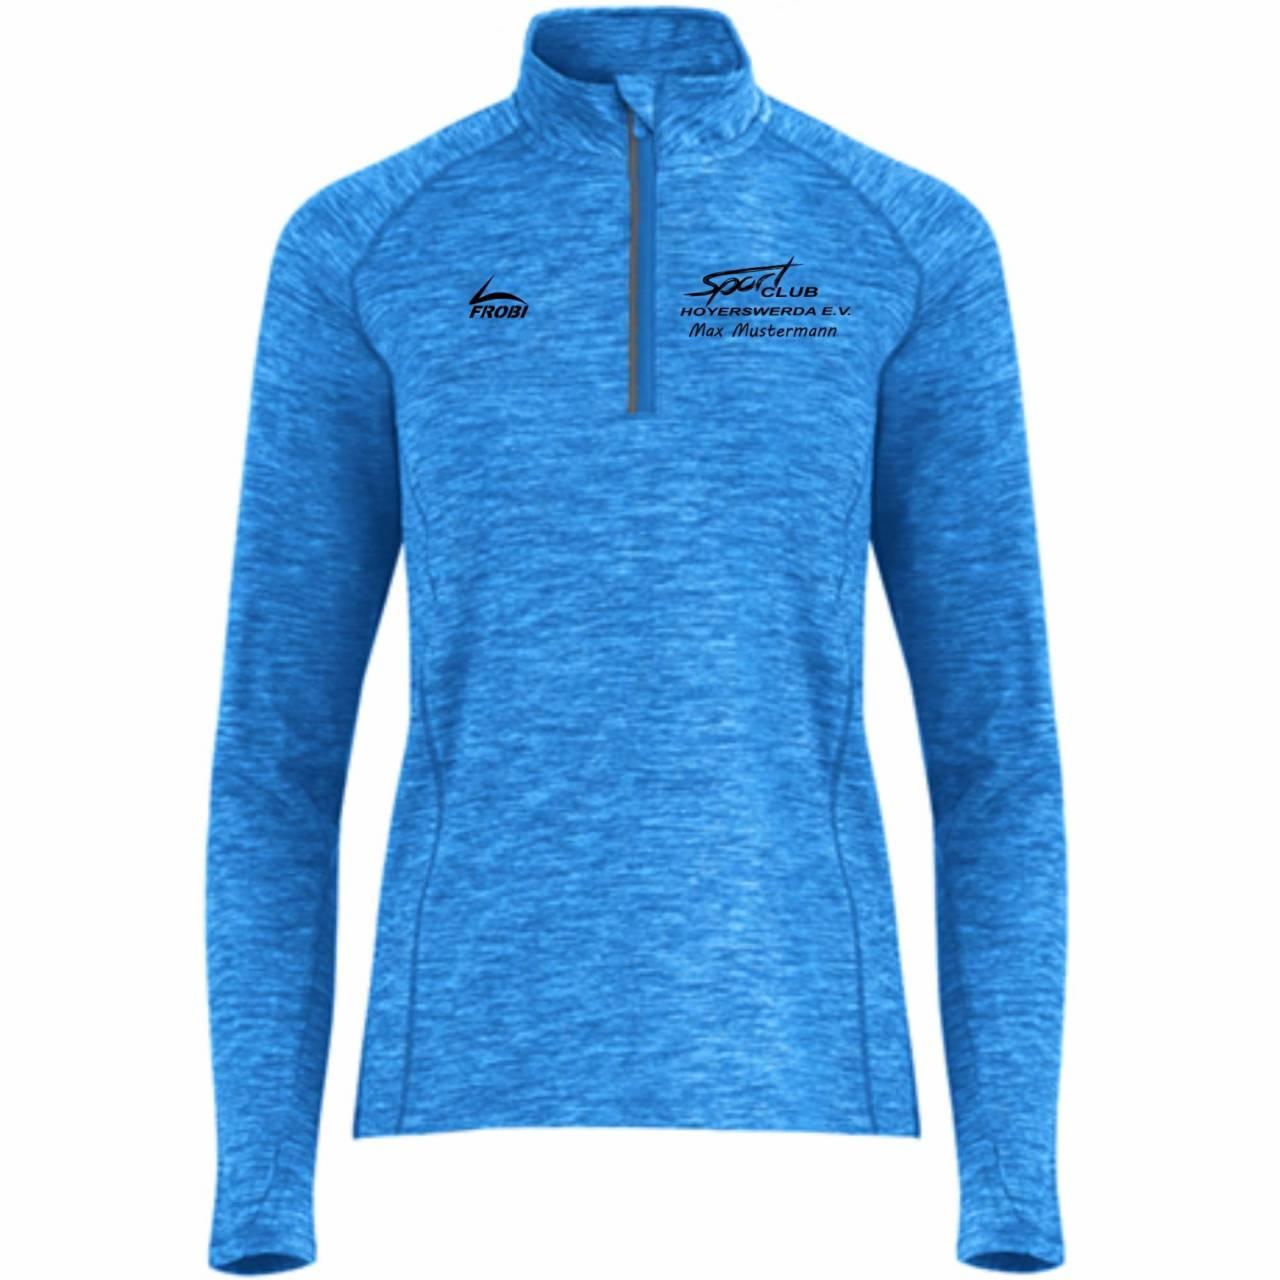 Funktions-Sweatshirt Montana / Women - SC Hoyerswerda